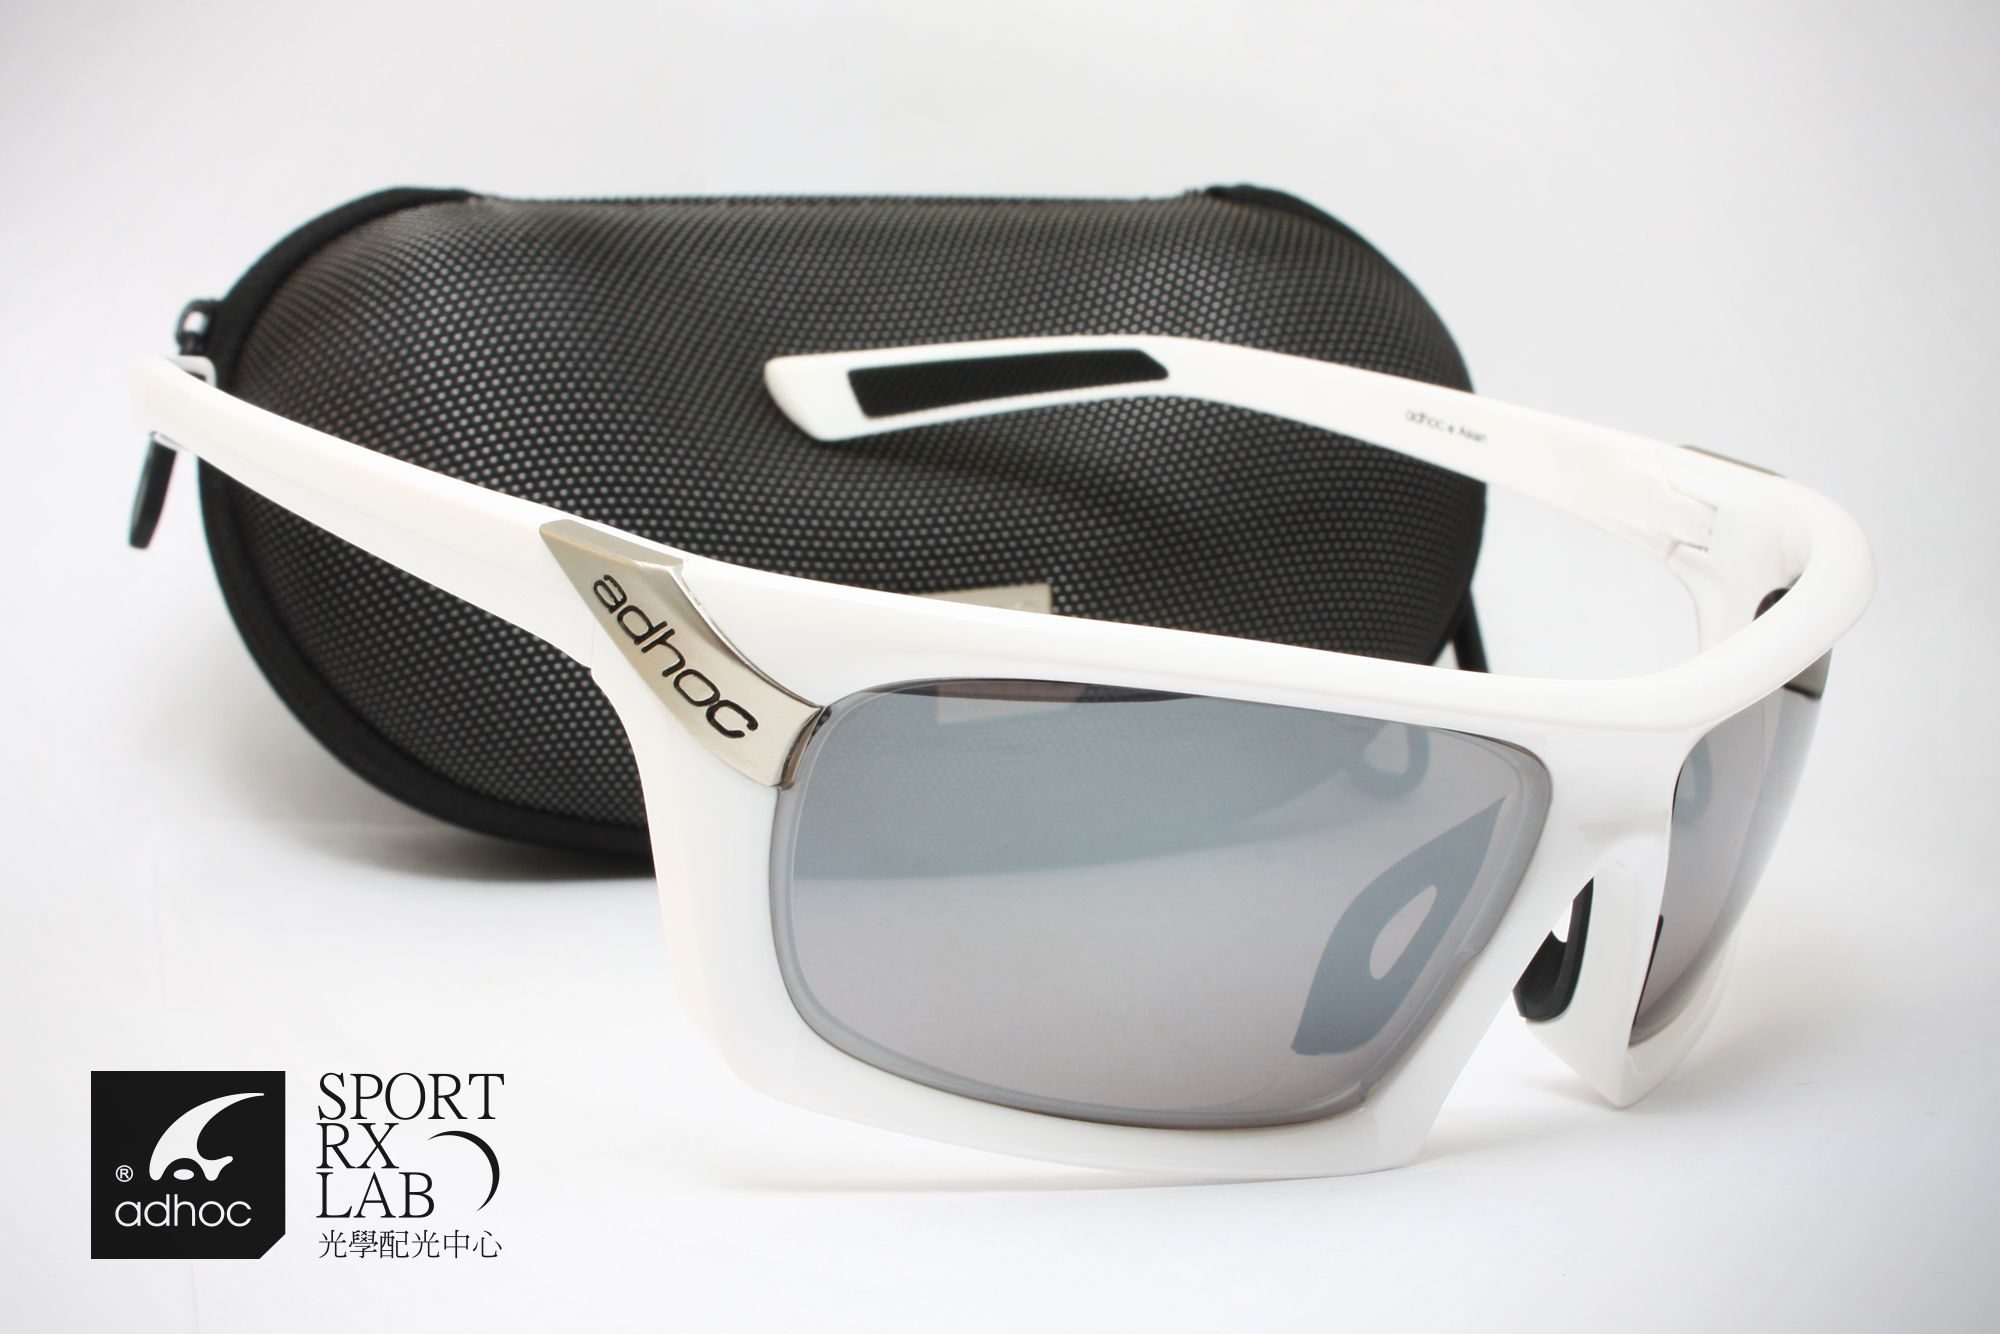 adhoc PARKER golf eyewear with adhoc RX optic lens Golf